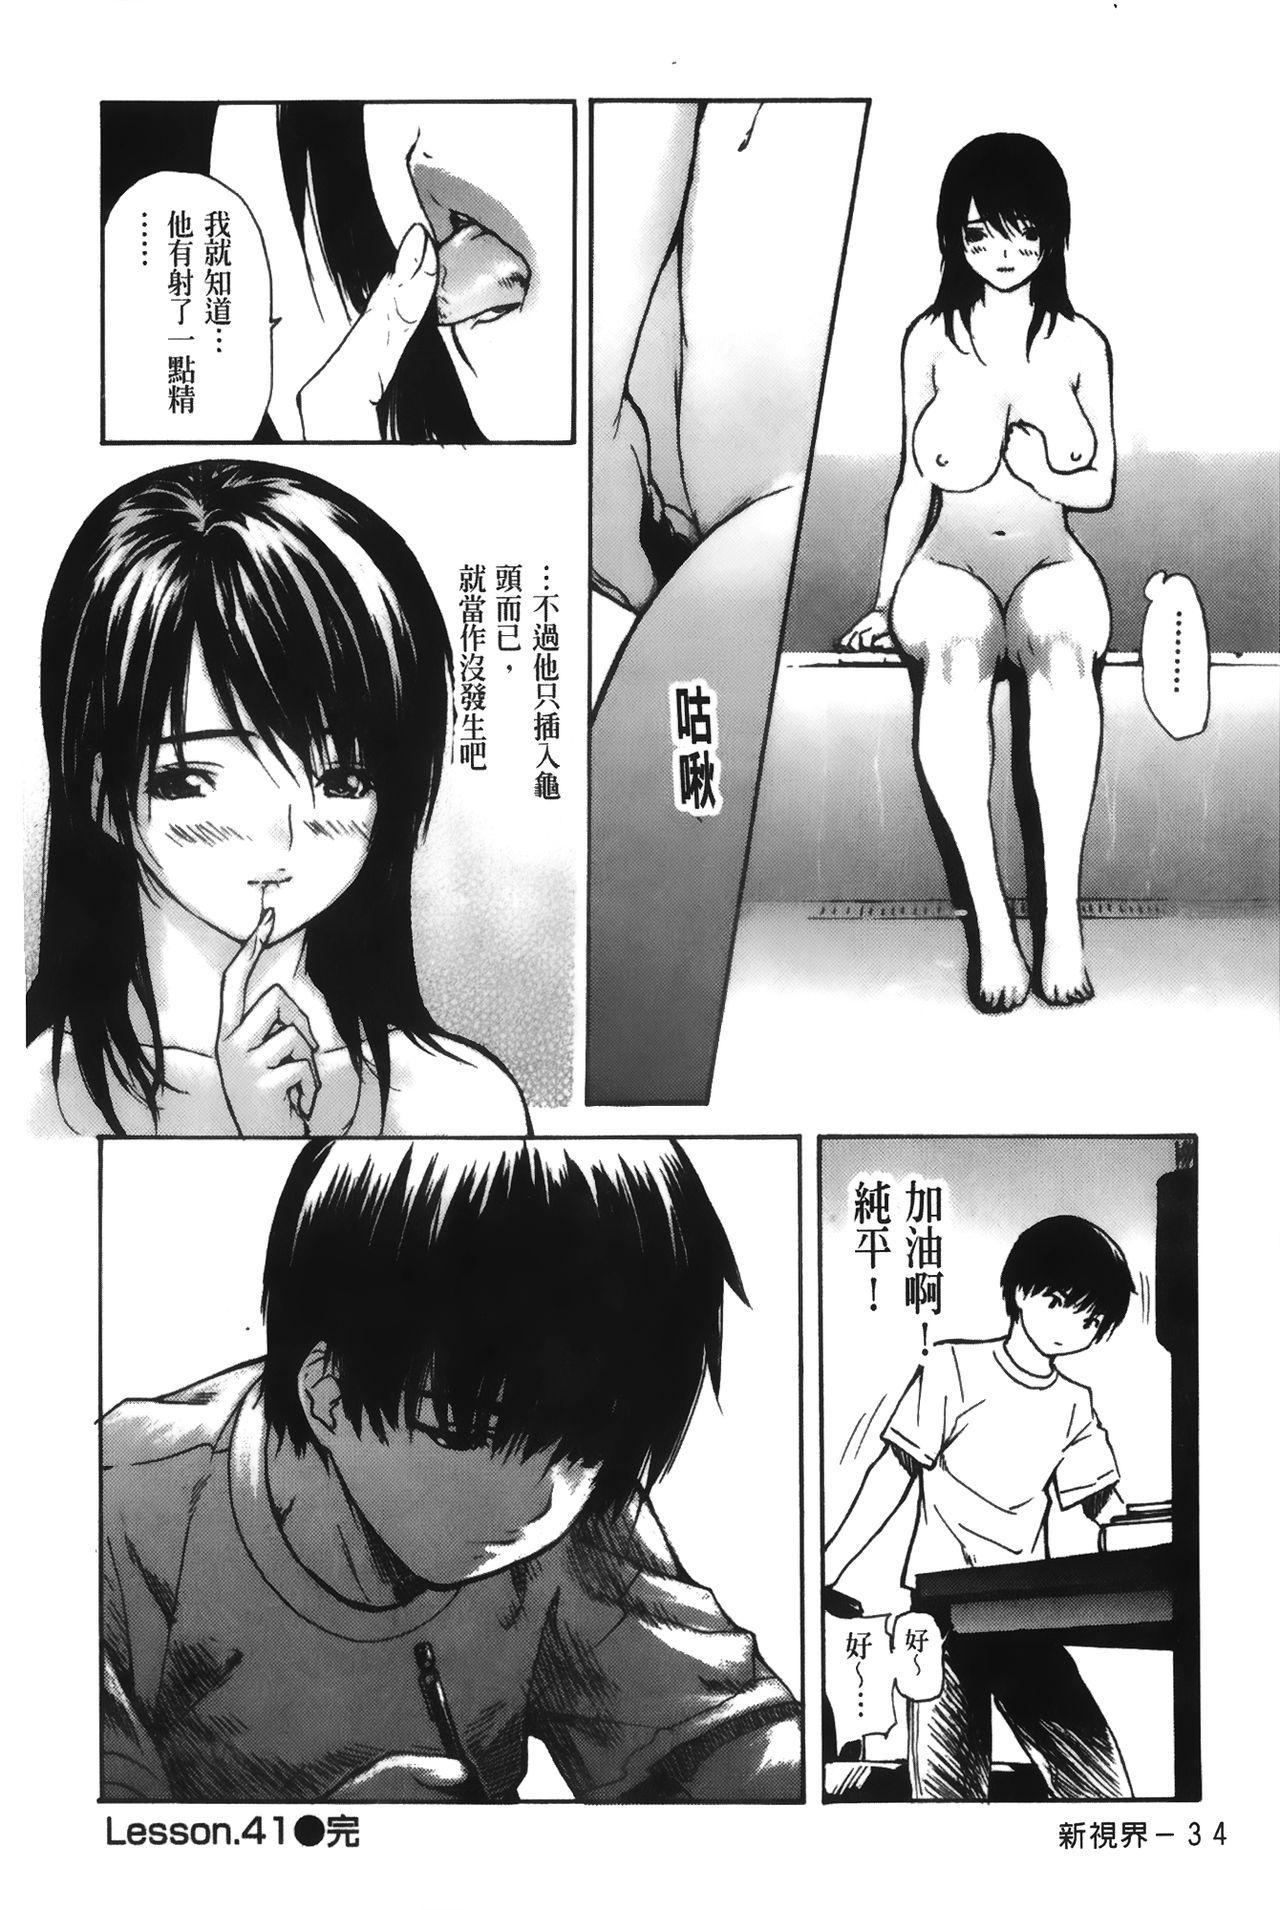 Tonari no Minano Sensei 4 | 隔壁的美奈乃老師 4 201